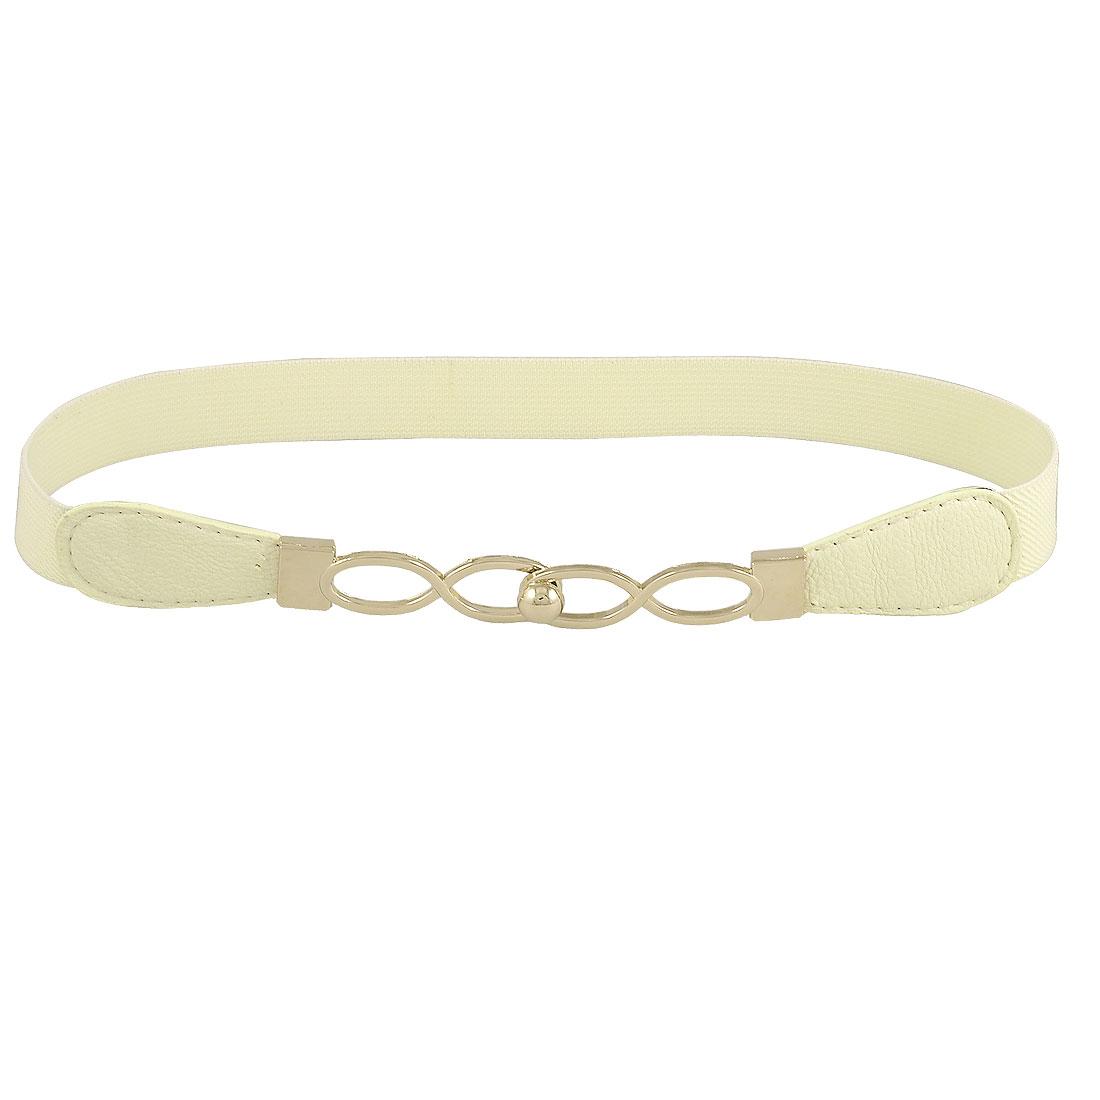 Lady Gold Tone Eight Shaped Buckle Elastic Skinny Cinch Waistband Belt Beige